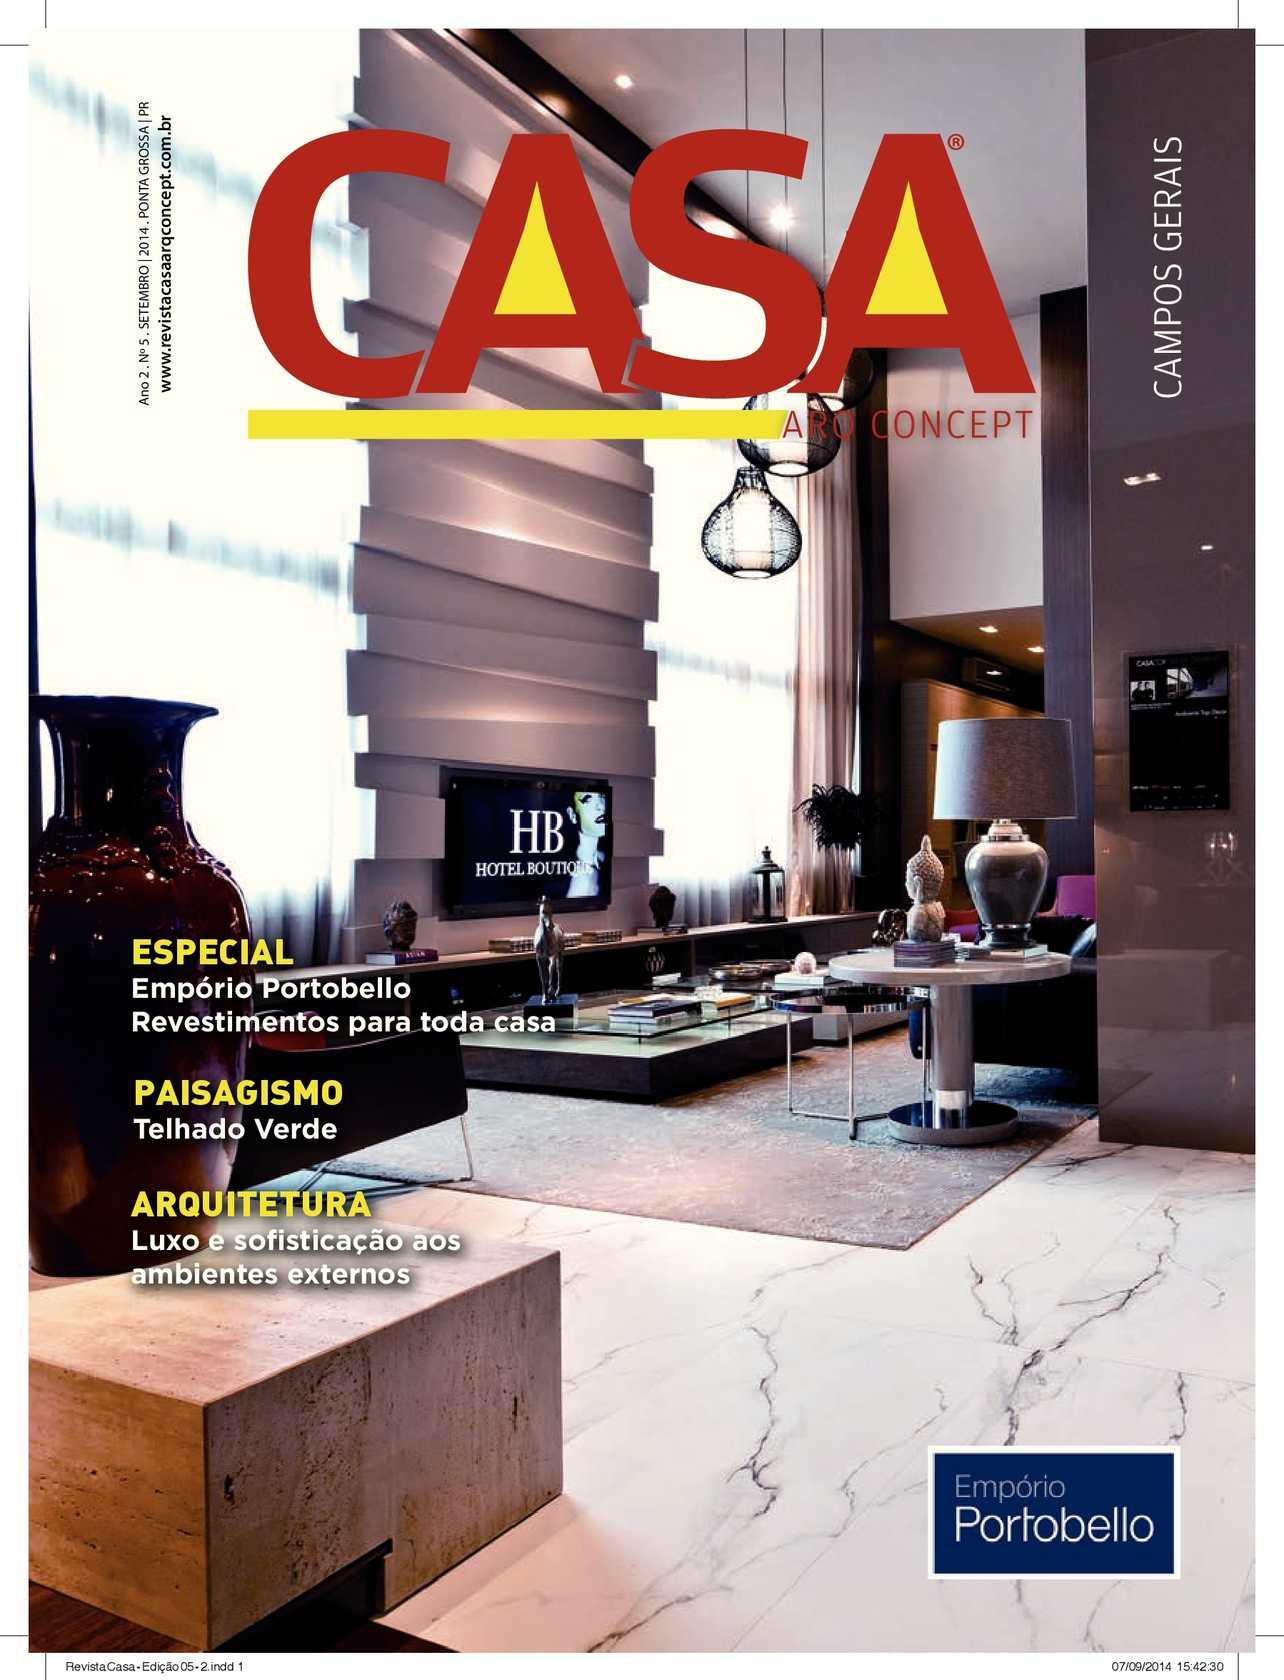 Calaméo - Revista Casa Arq Concept  4 cc8174f180756